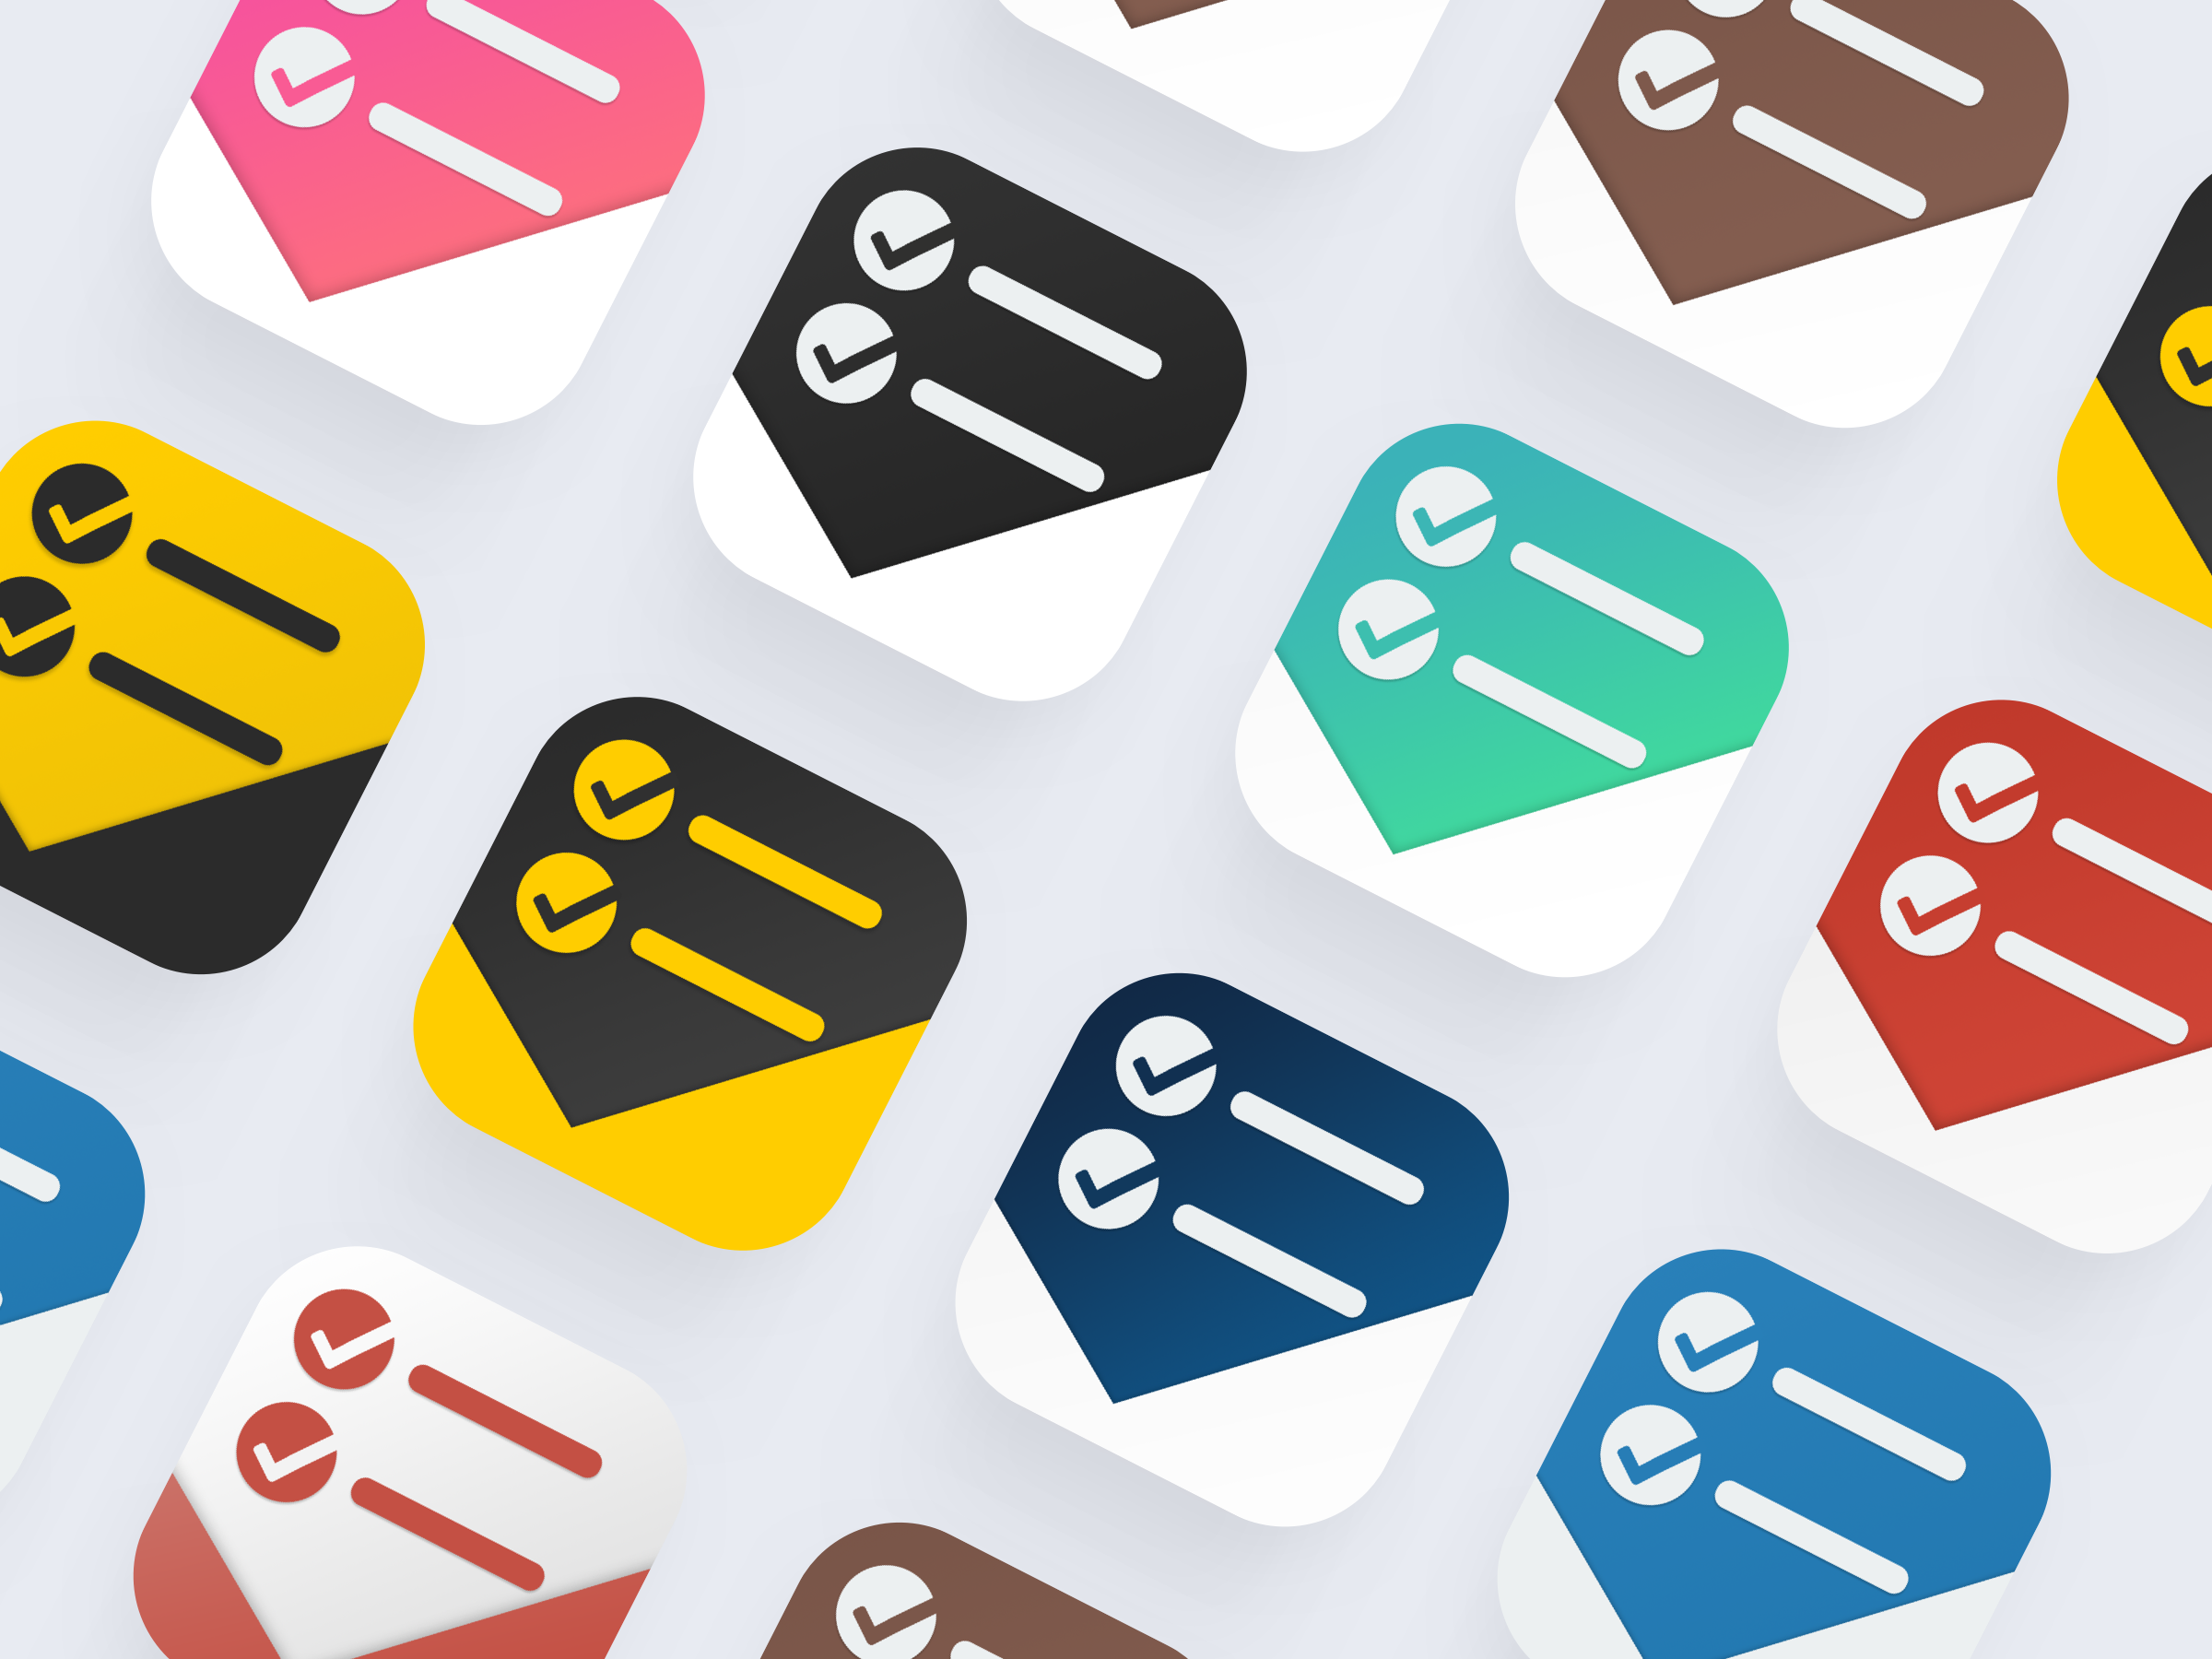 Toodoo app icon colors